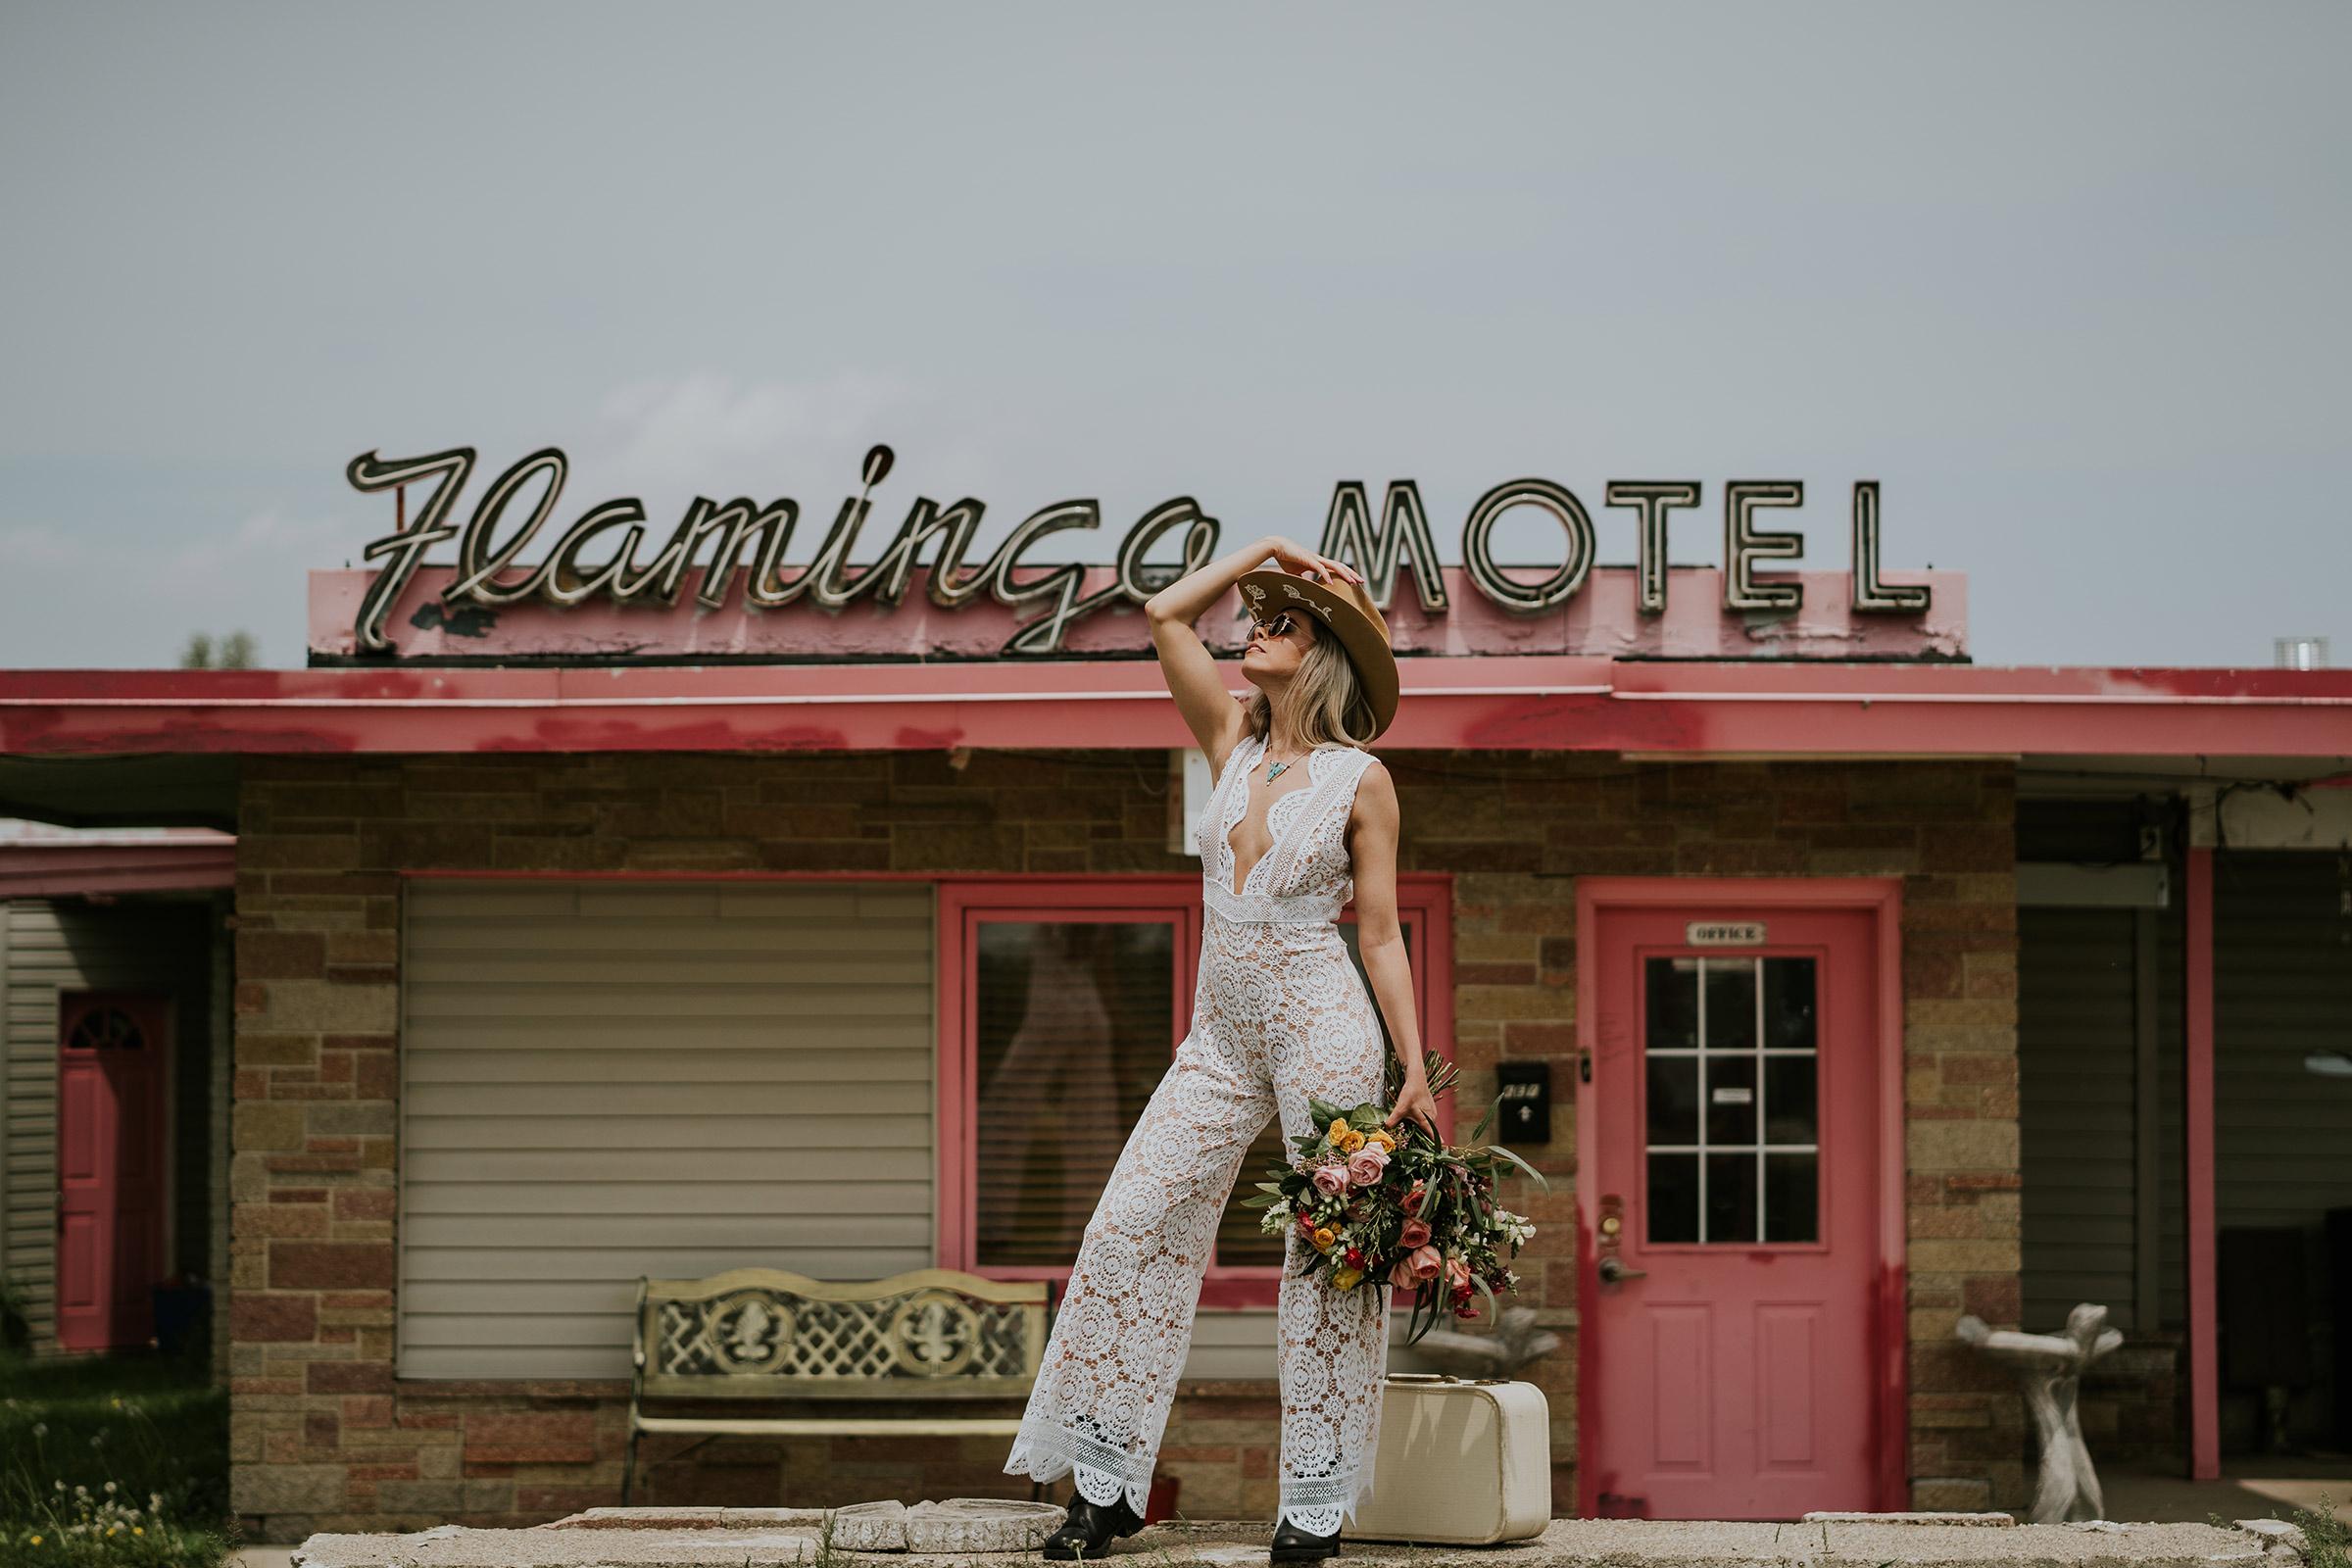 bride-wearing-dame-and-maien-designs-jumpsuit-at-flamingo-hotel-iowa-road-trip-romance-wedding-raelyn-ramey-photography-145.jpg